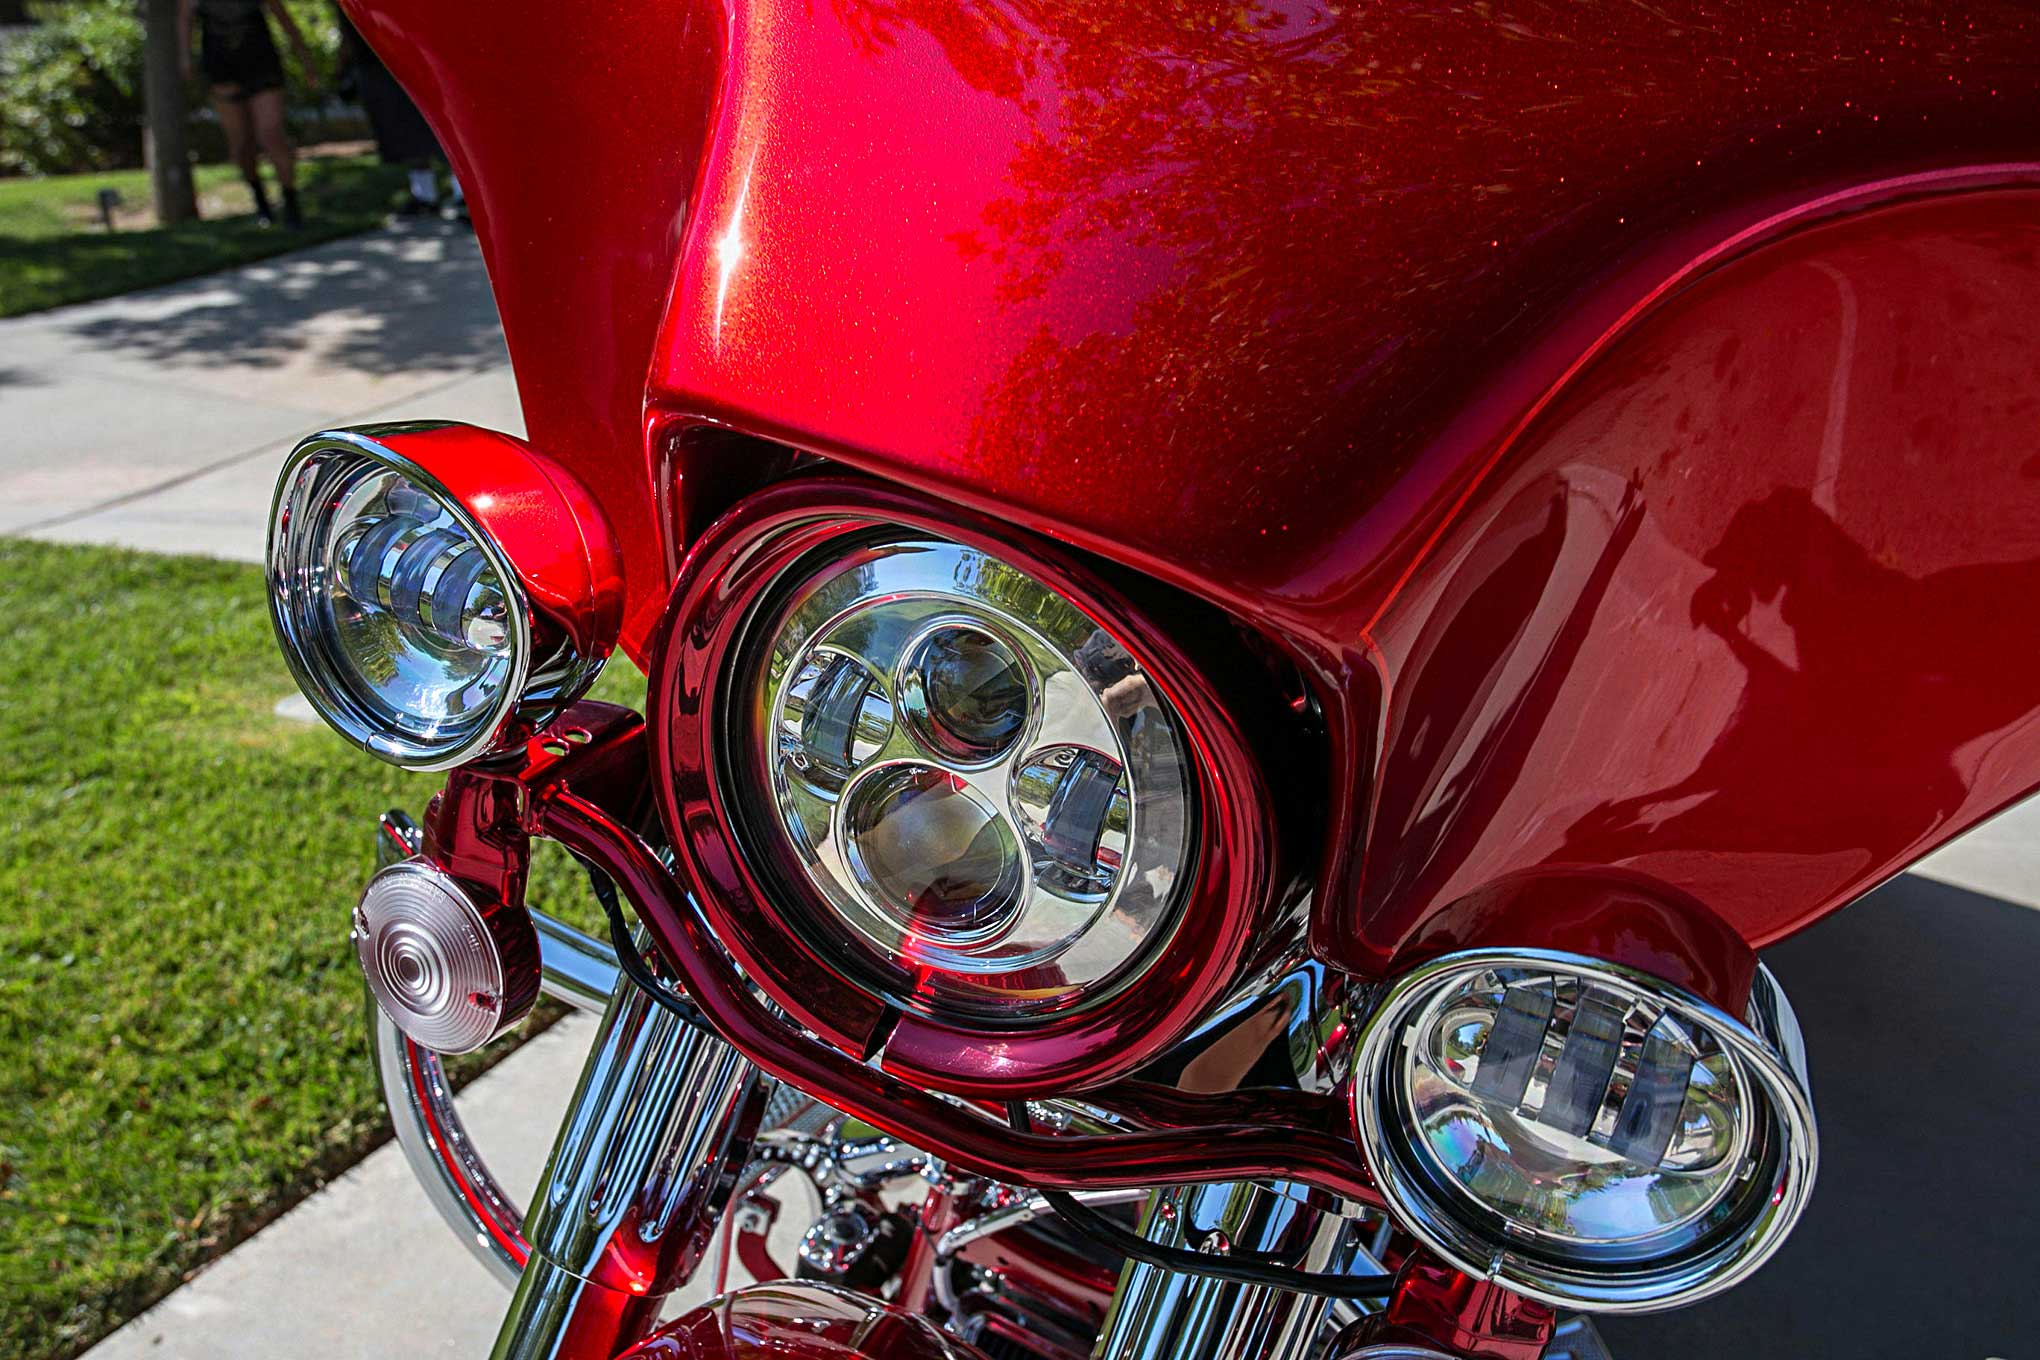 14 Inch Tires >> Serafin Romero's 2005 Harley-Davidson Road King